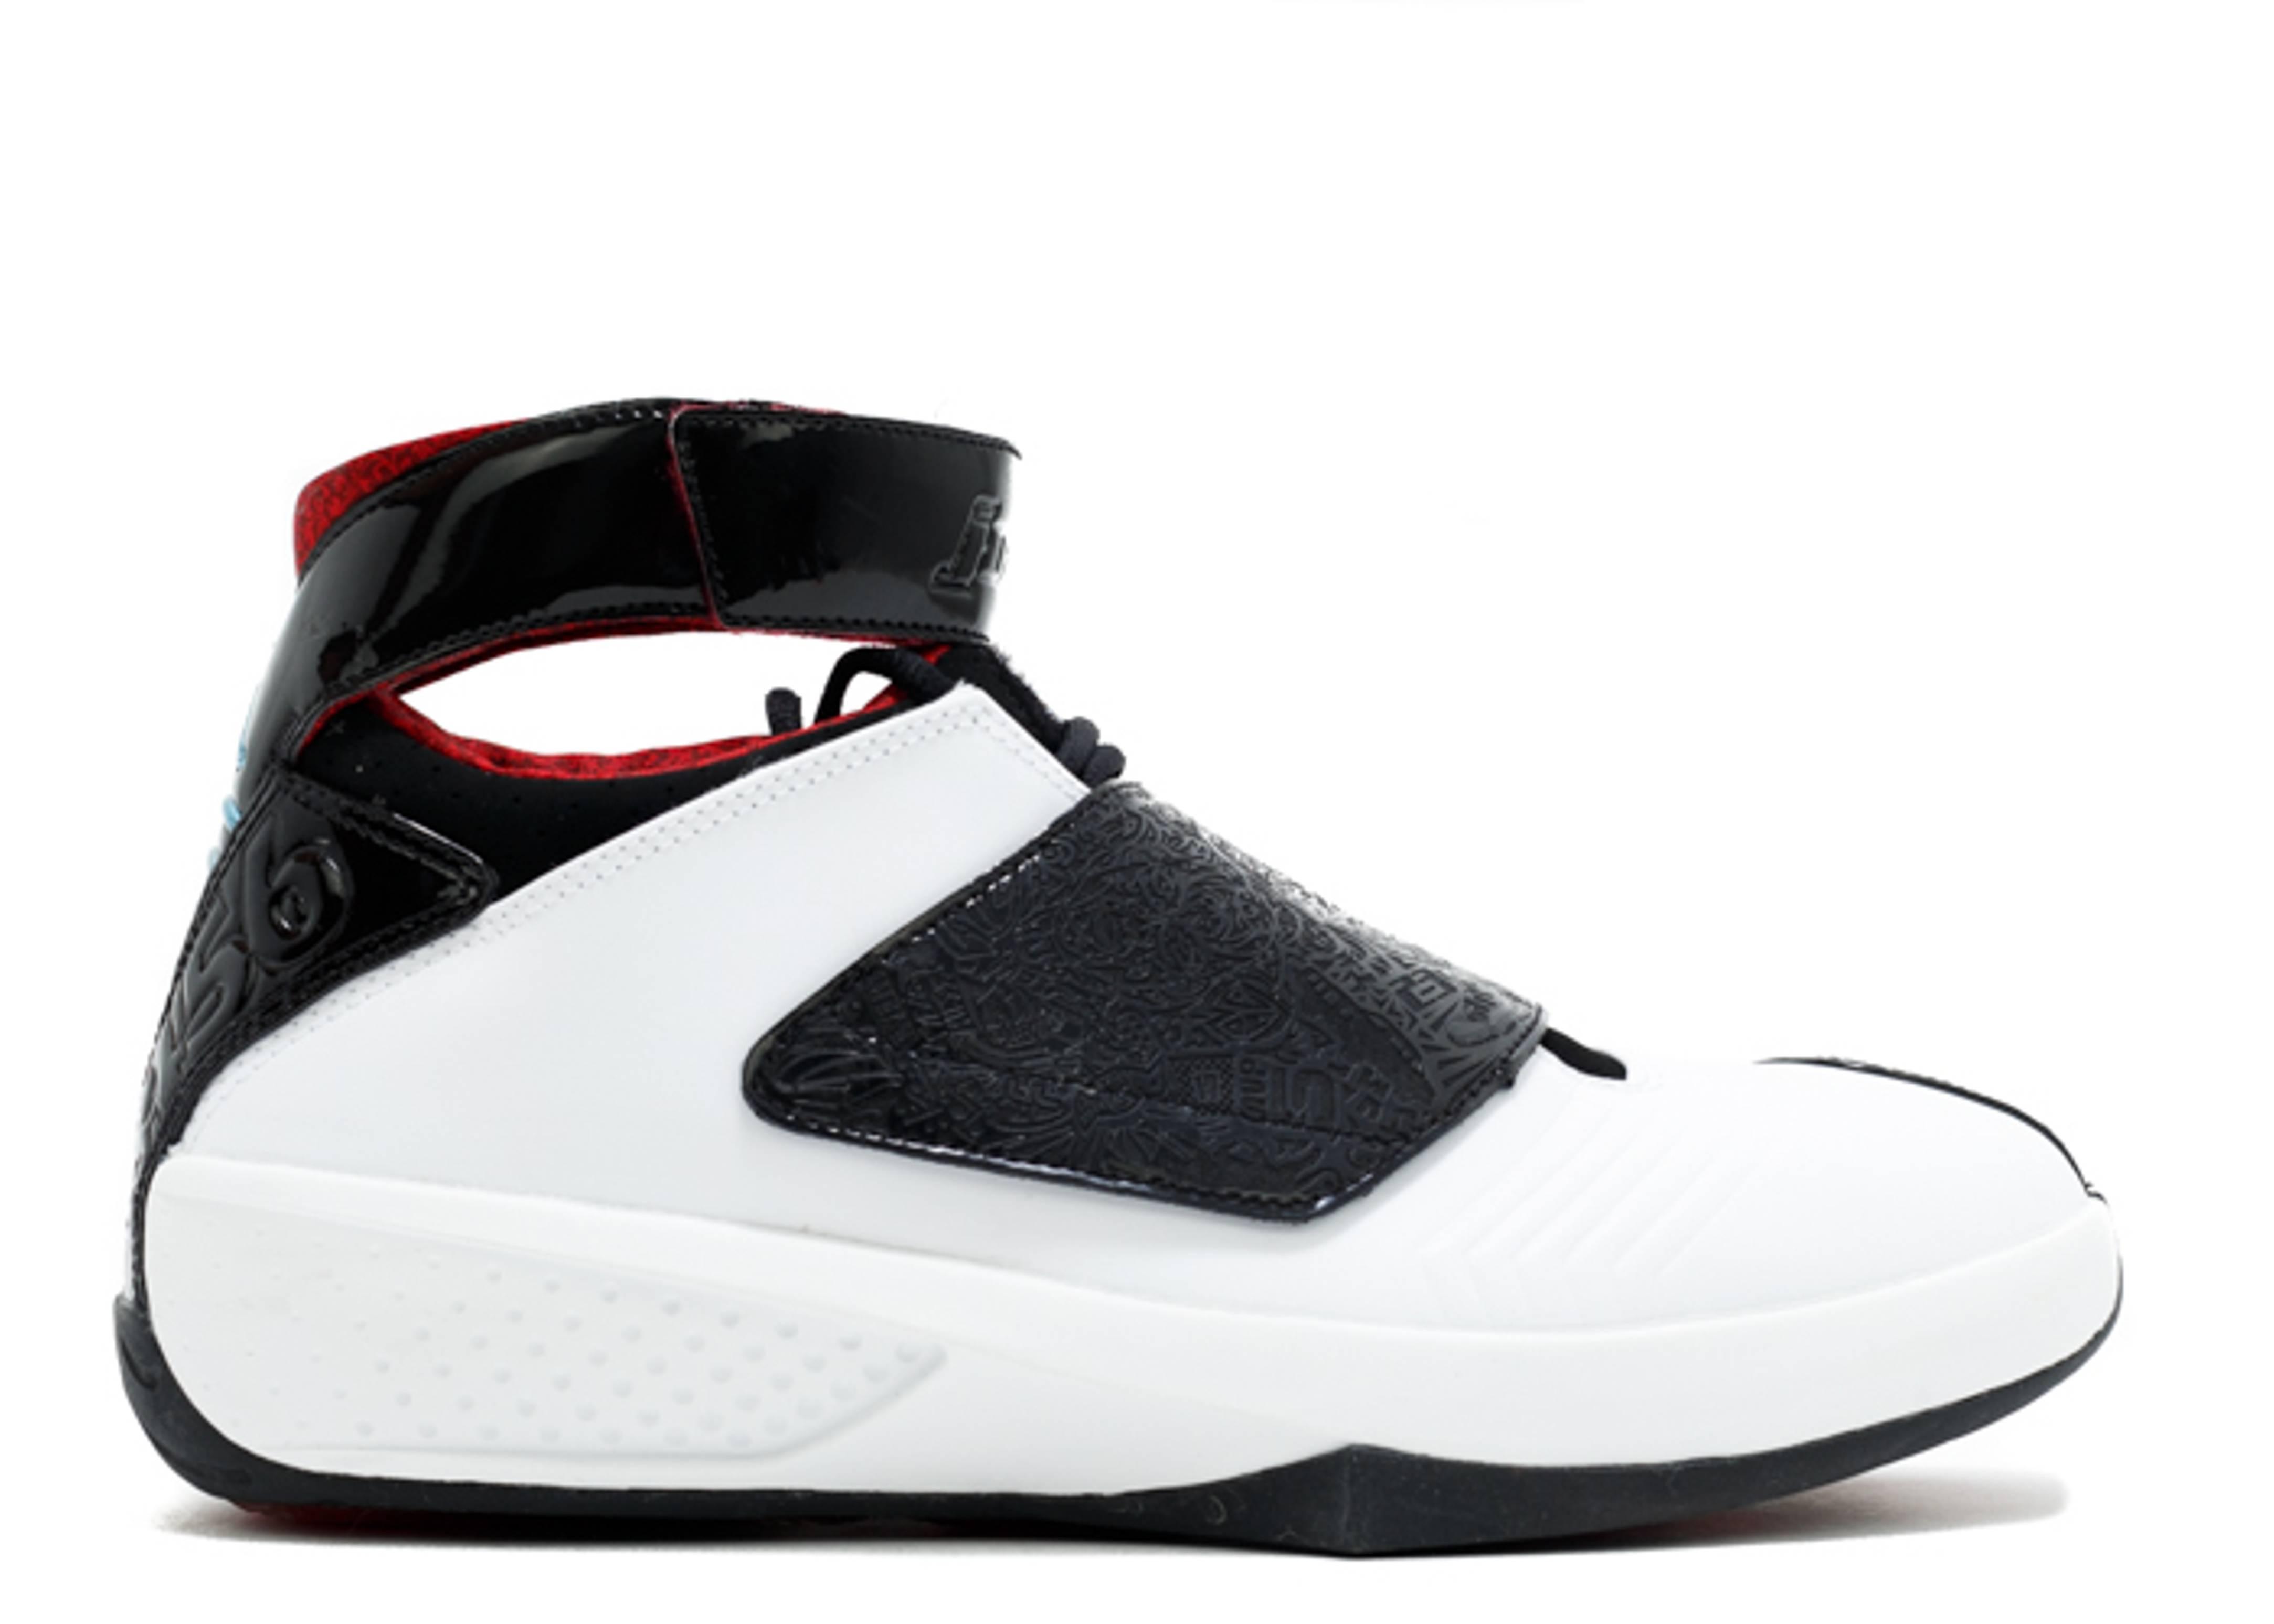 82b5cee1d7f0 Air Jordan 20 (XX) Shoes - Nike